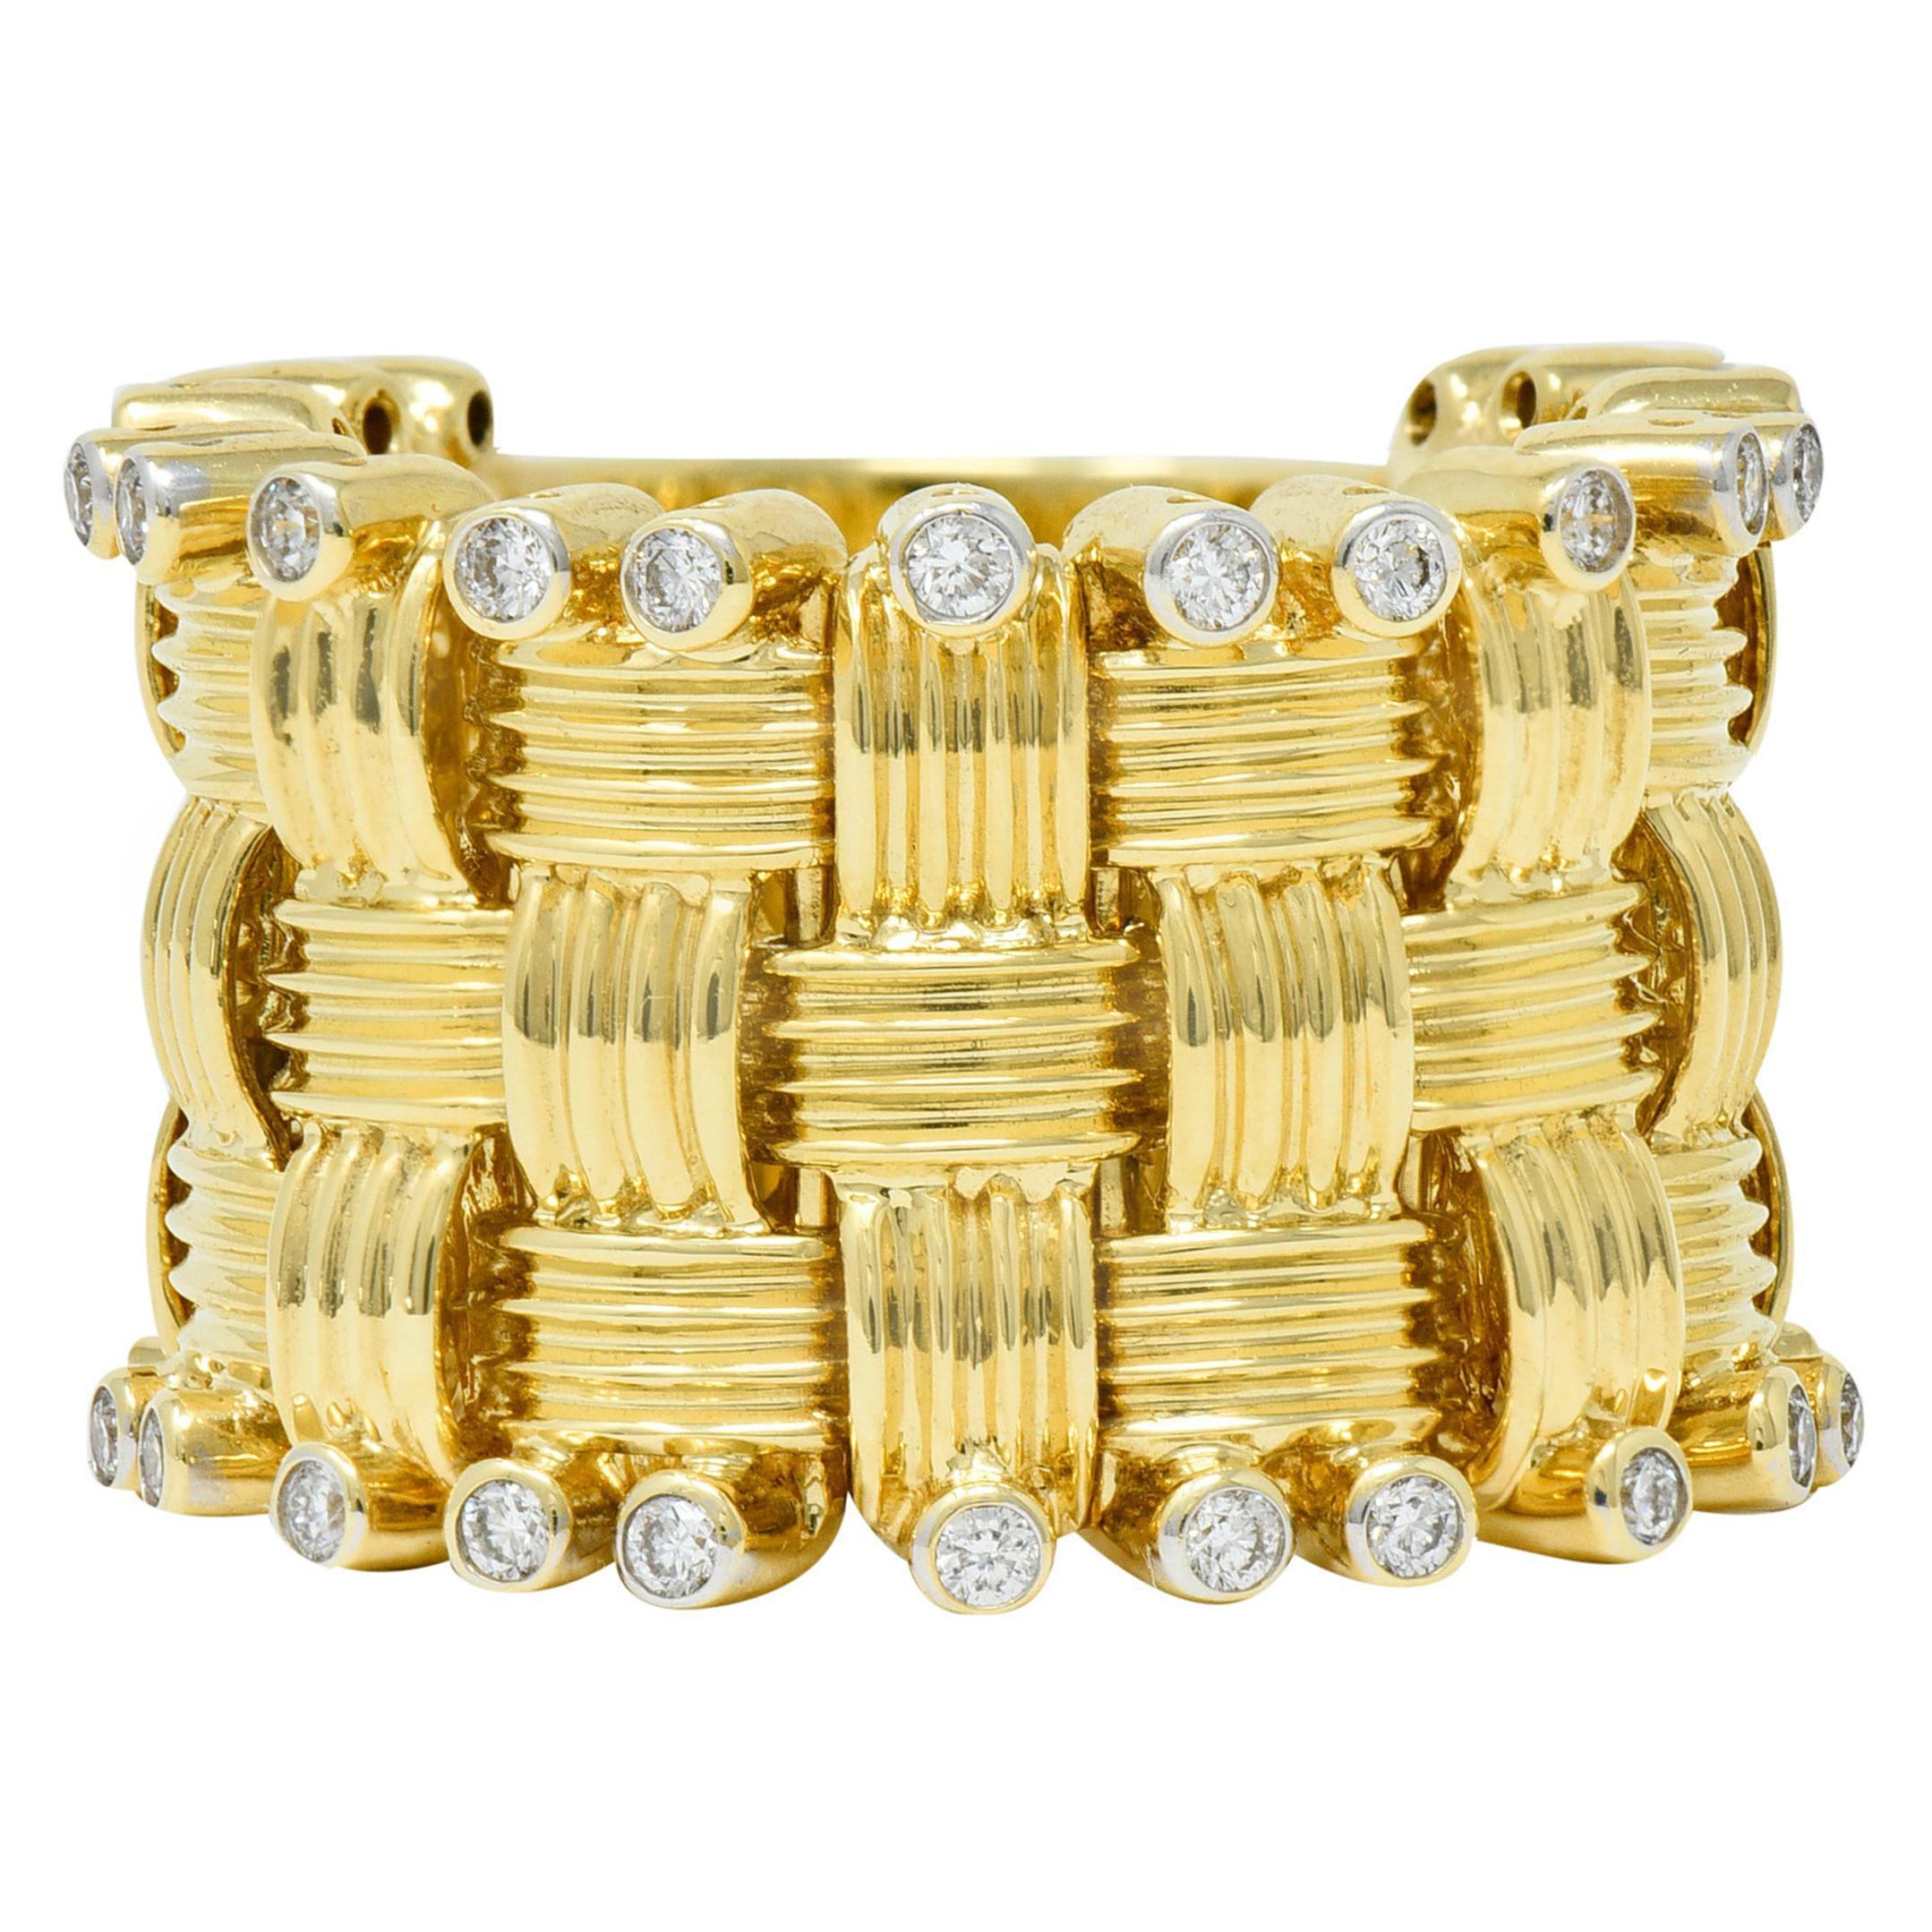 Roberto Coin 0.50 Carat Diamond 18 Karat Gold Flexible Appassionata Band Ring